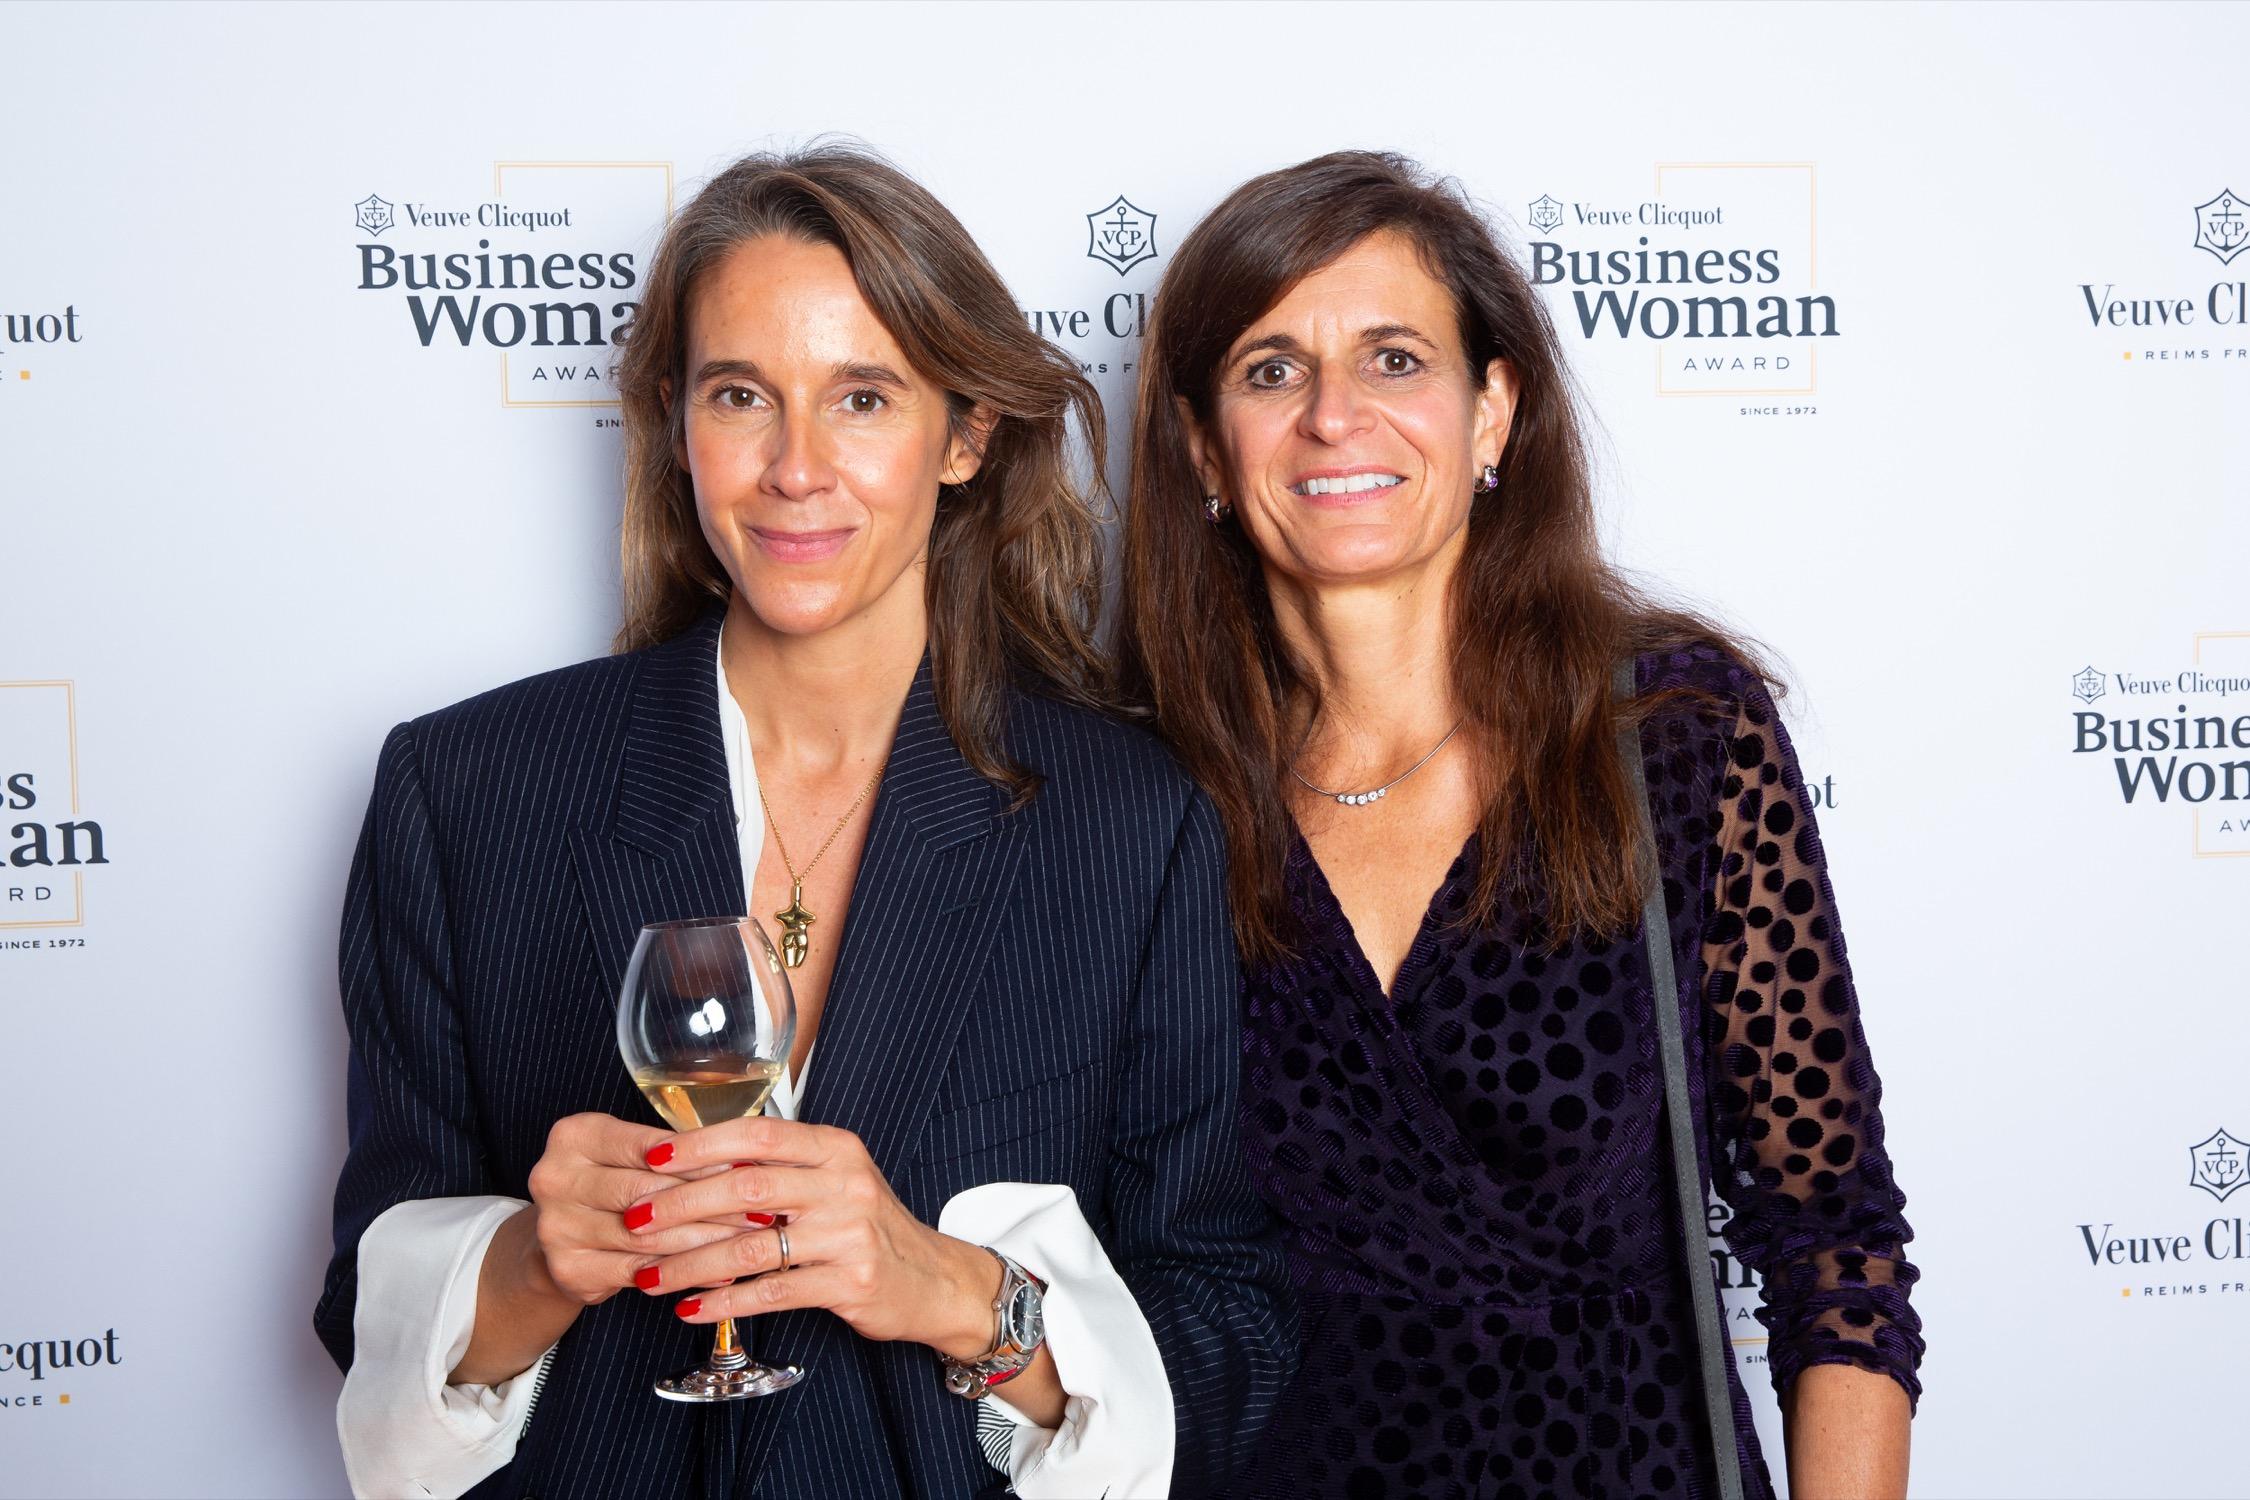 Carole Bildé and the winner of Veuve Clicquot Business Woman Award 2019 Monika Walser